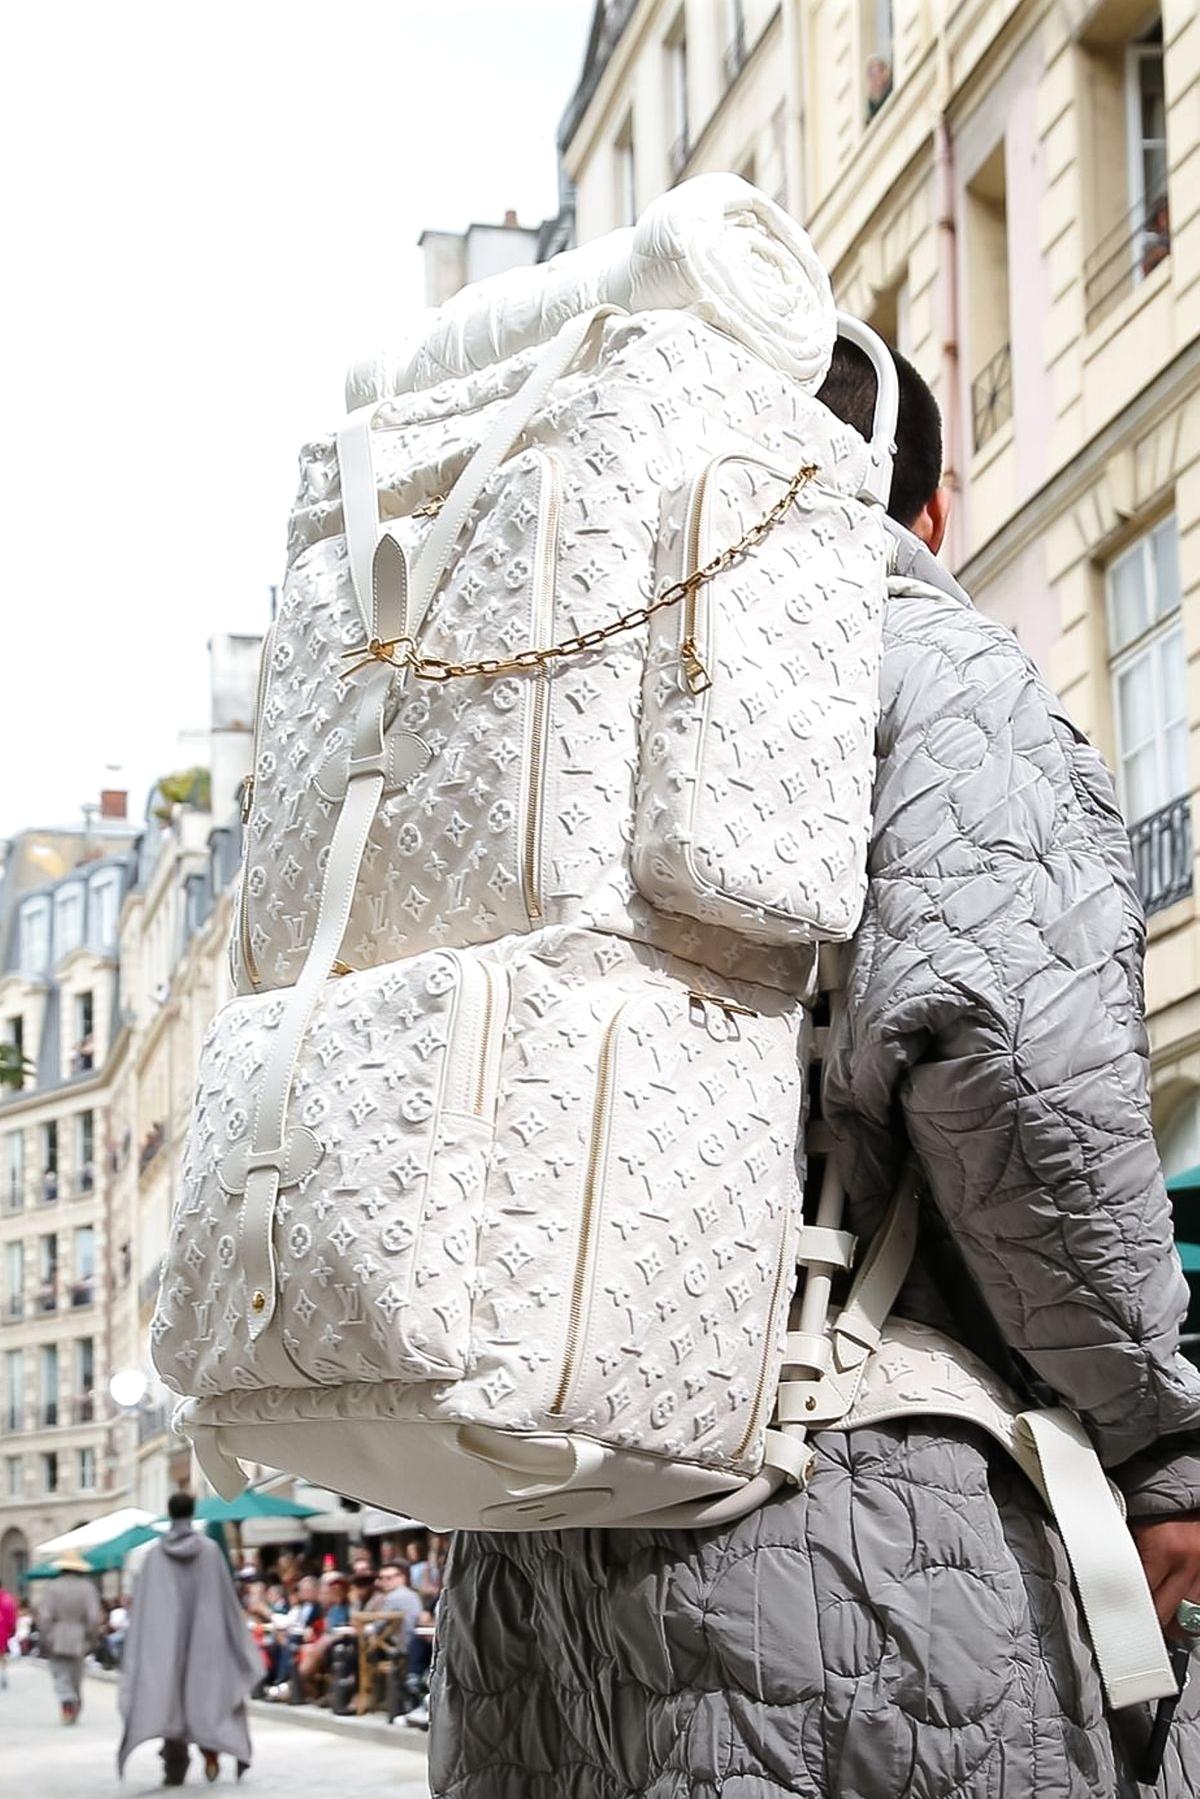 Рюкзак из коллекции Louis Vuitton Spring/Summer 2020 Menswear